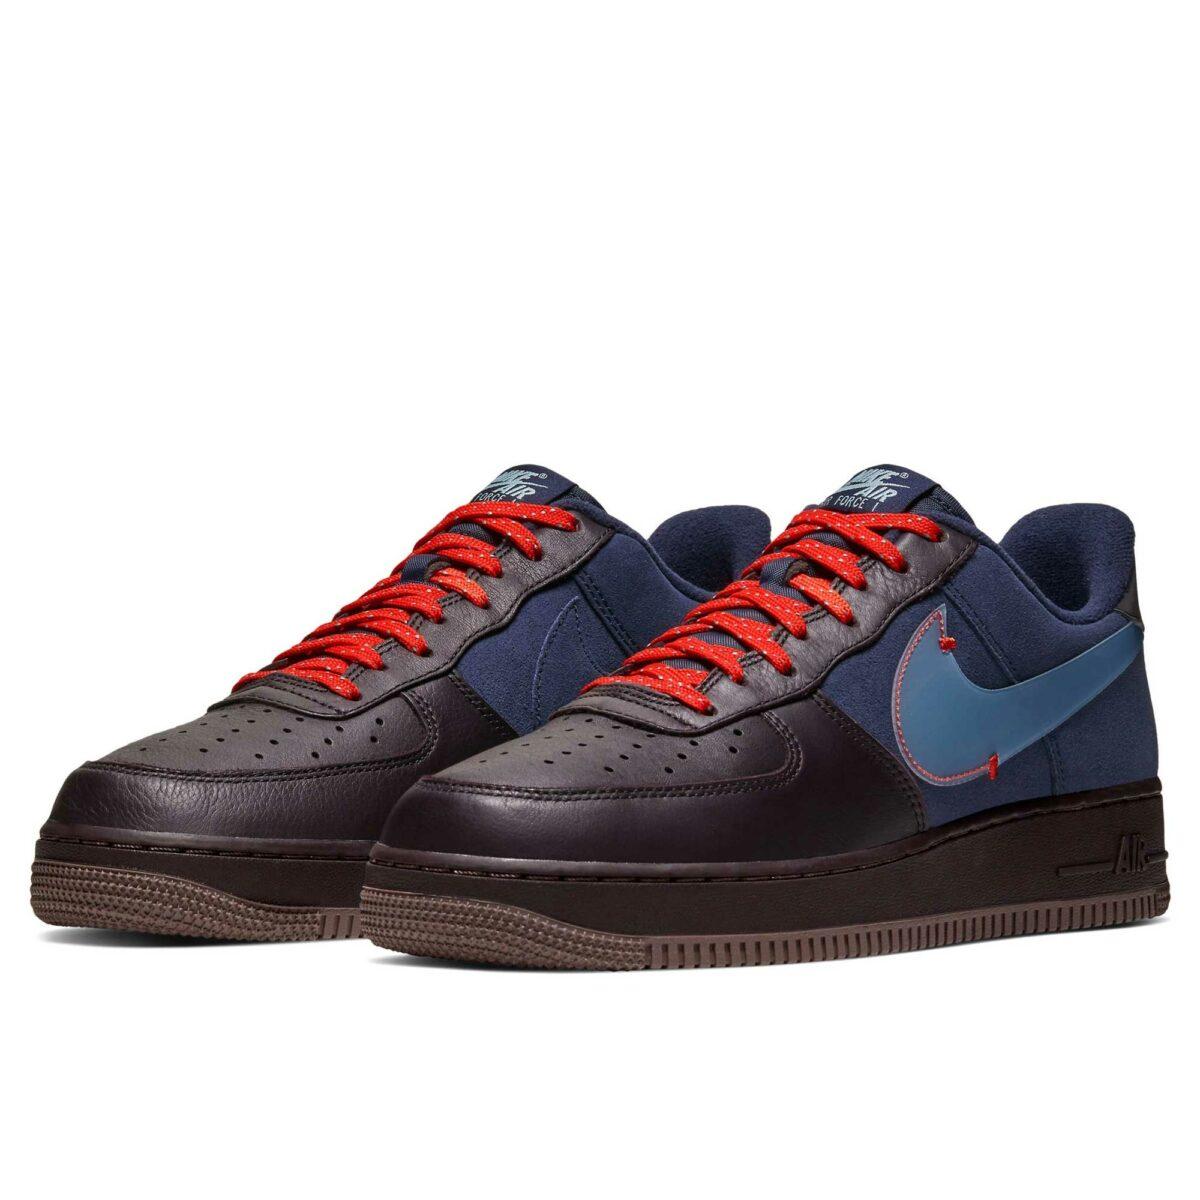 nike air force 1 premium black blue cq6367_600 купить